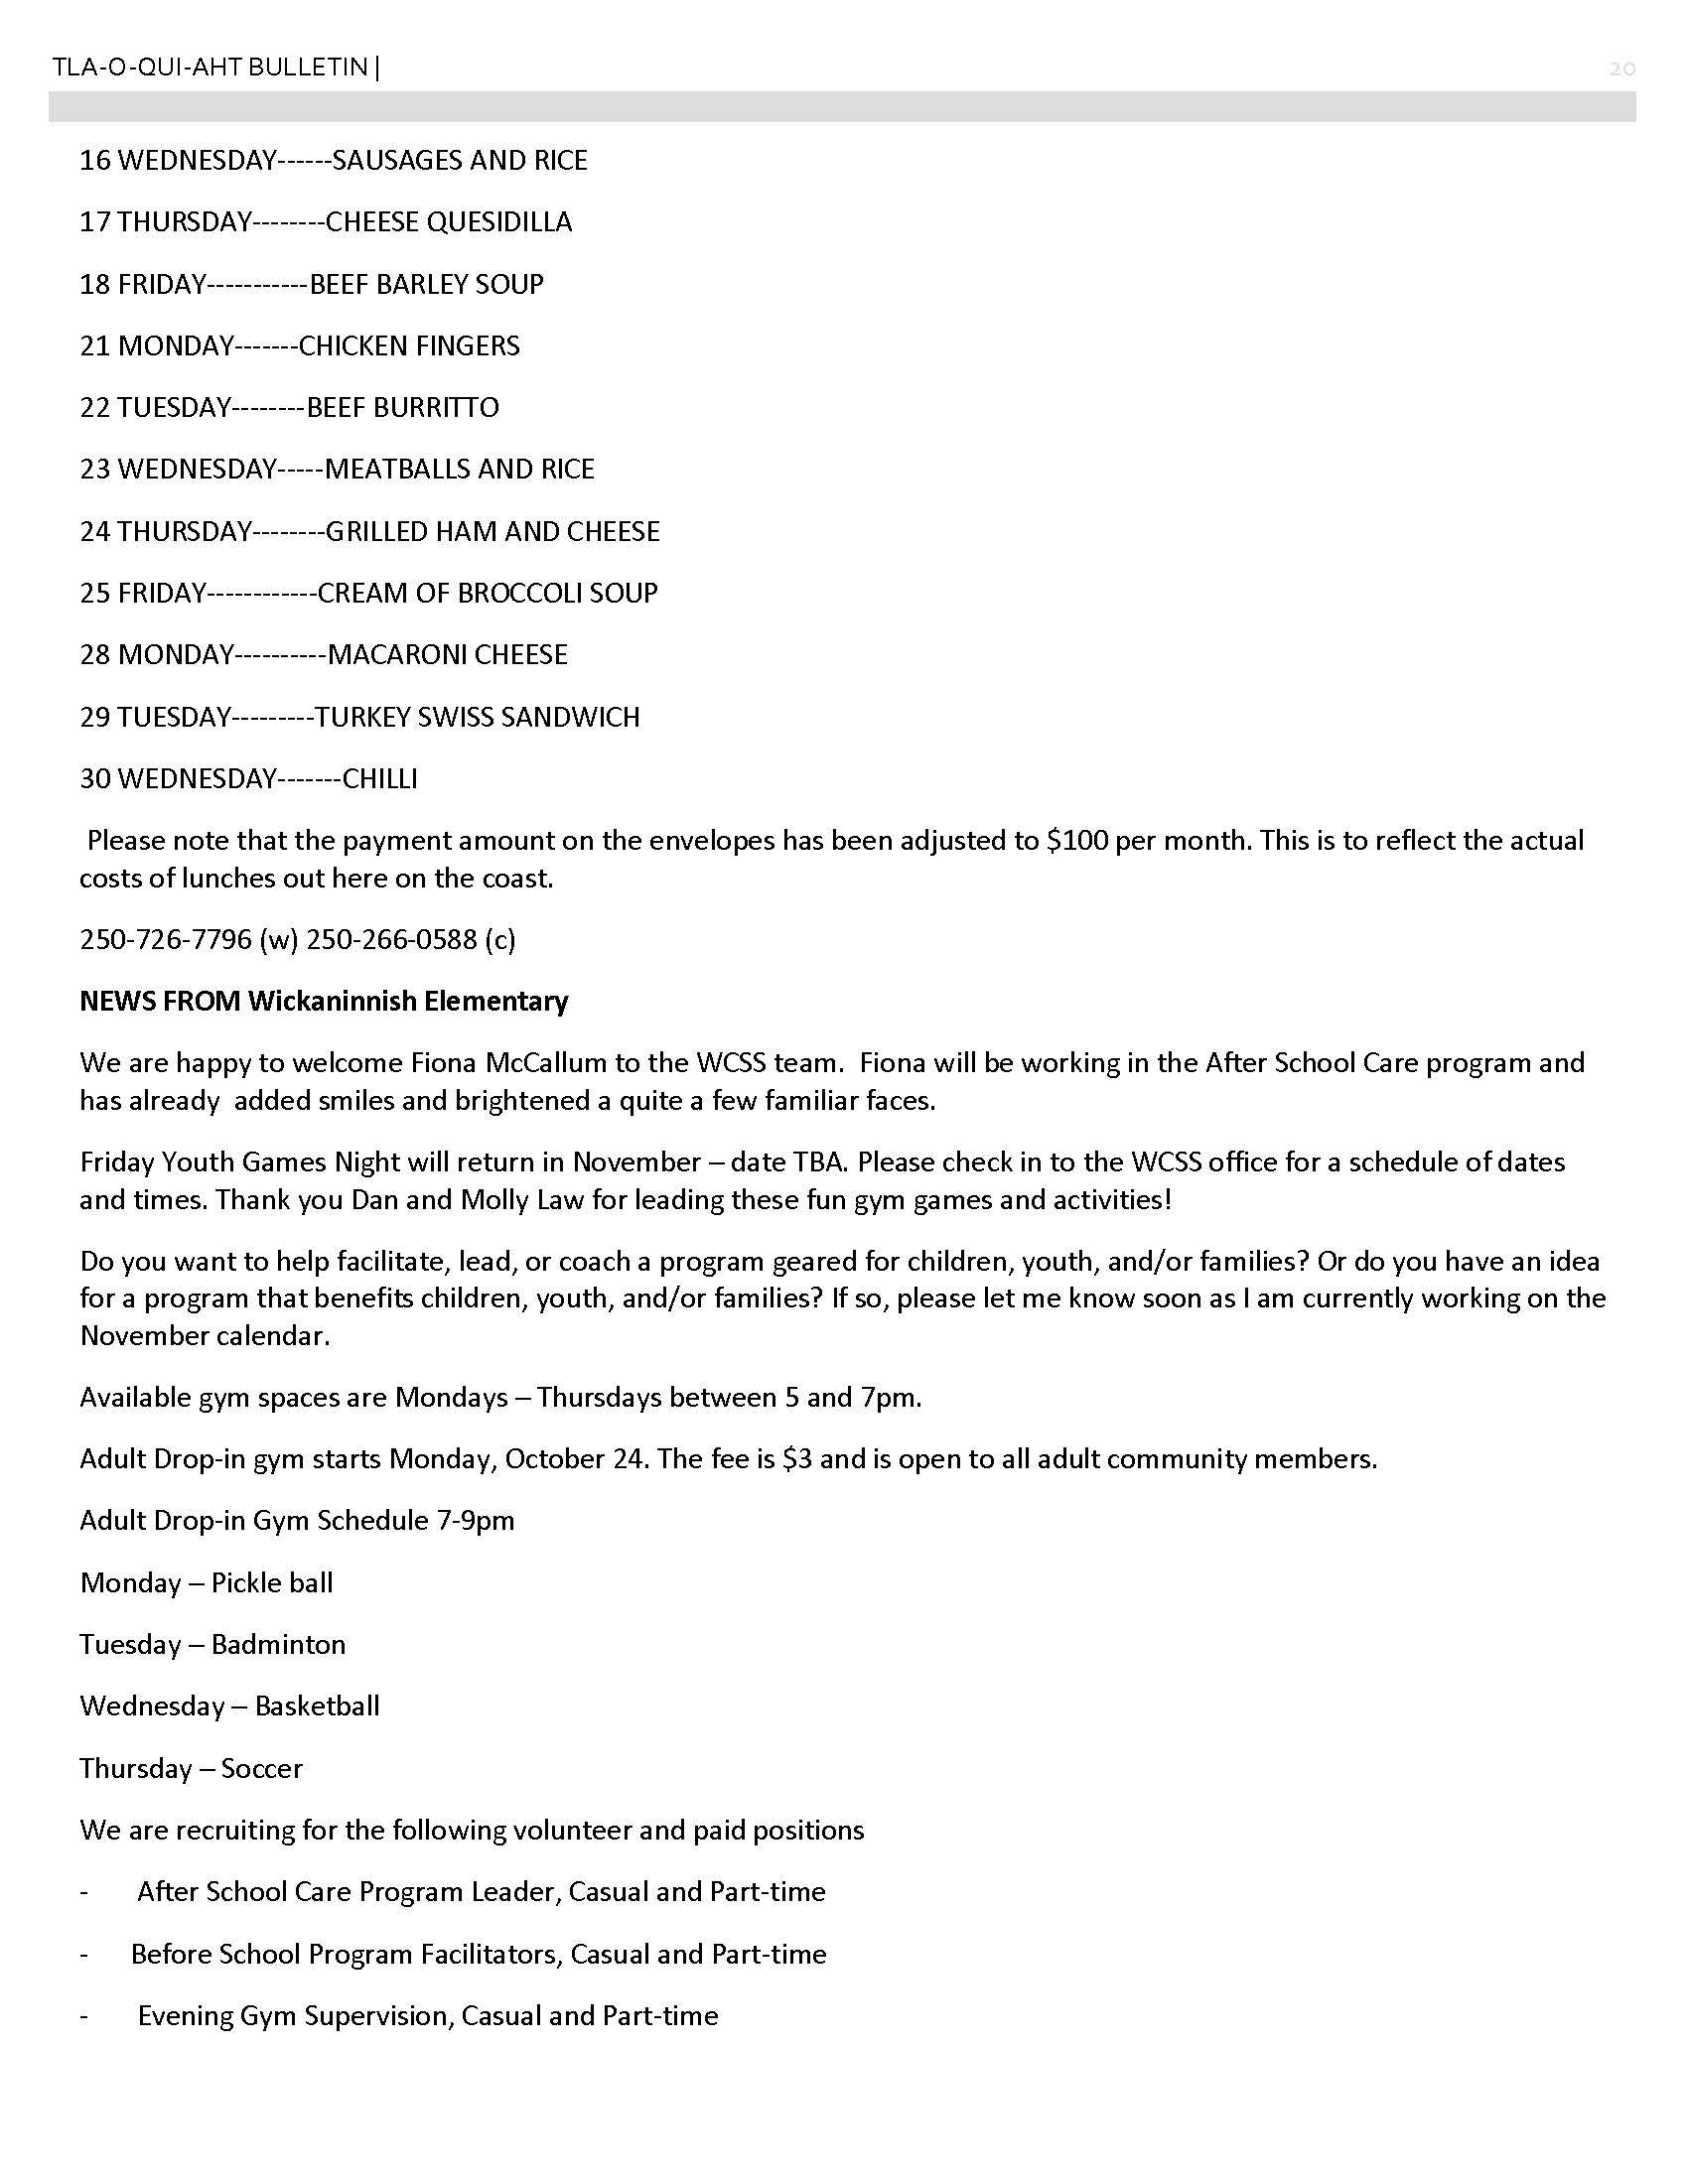 TFN Bulletin Nov 1st 2016_Page_20.jpg